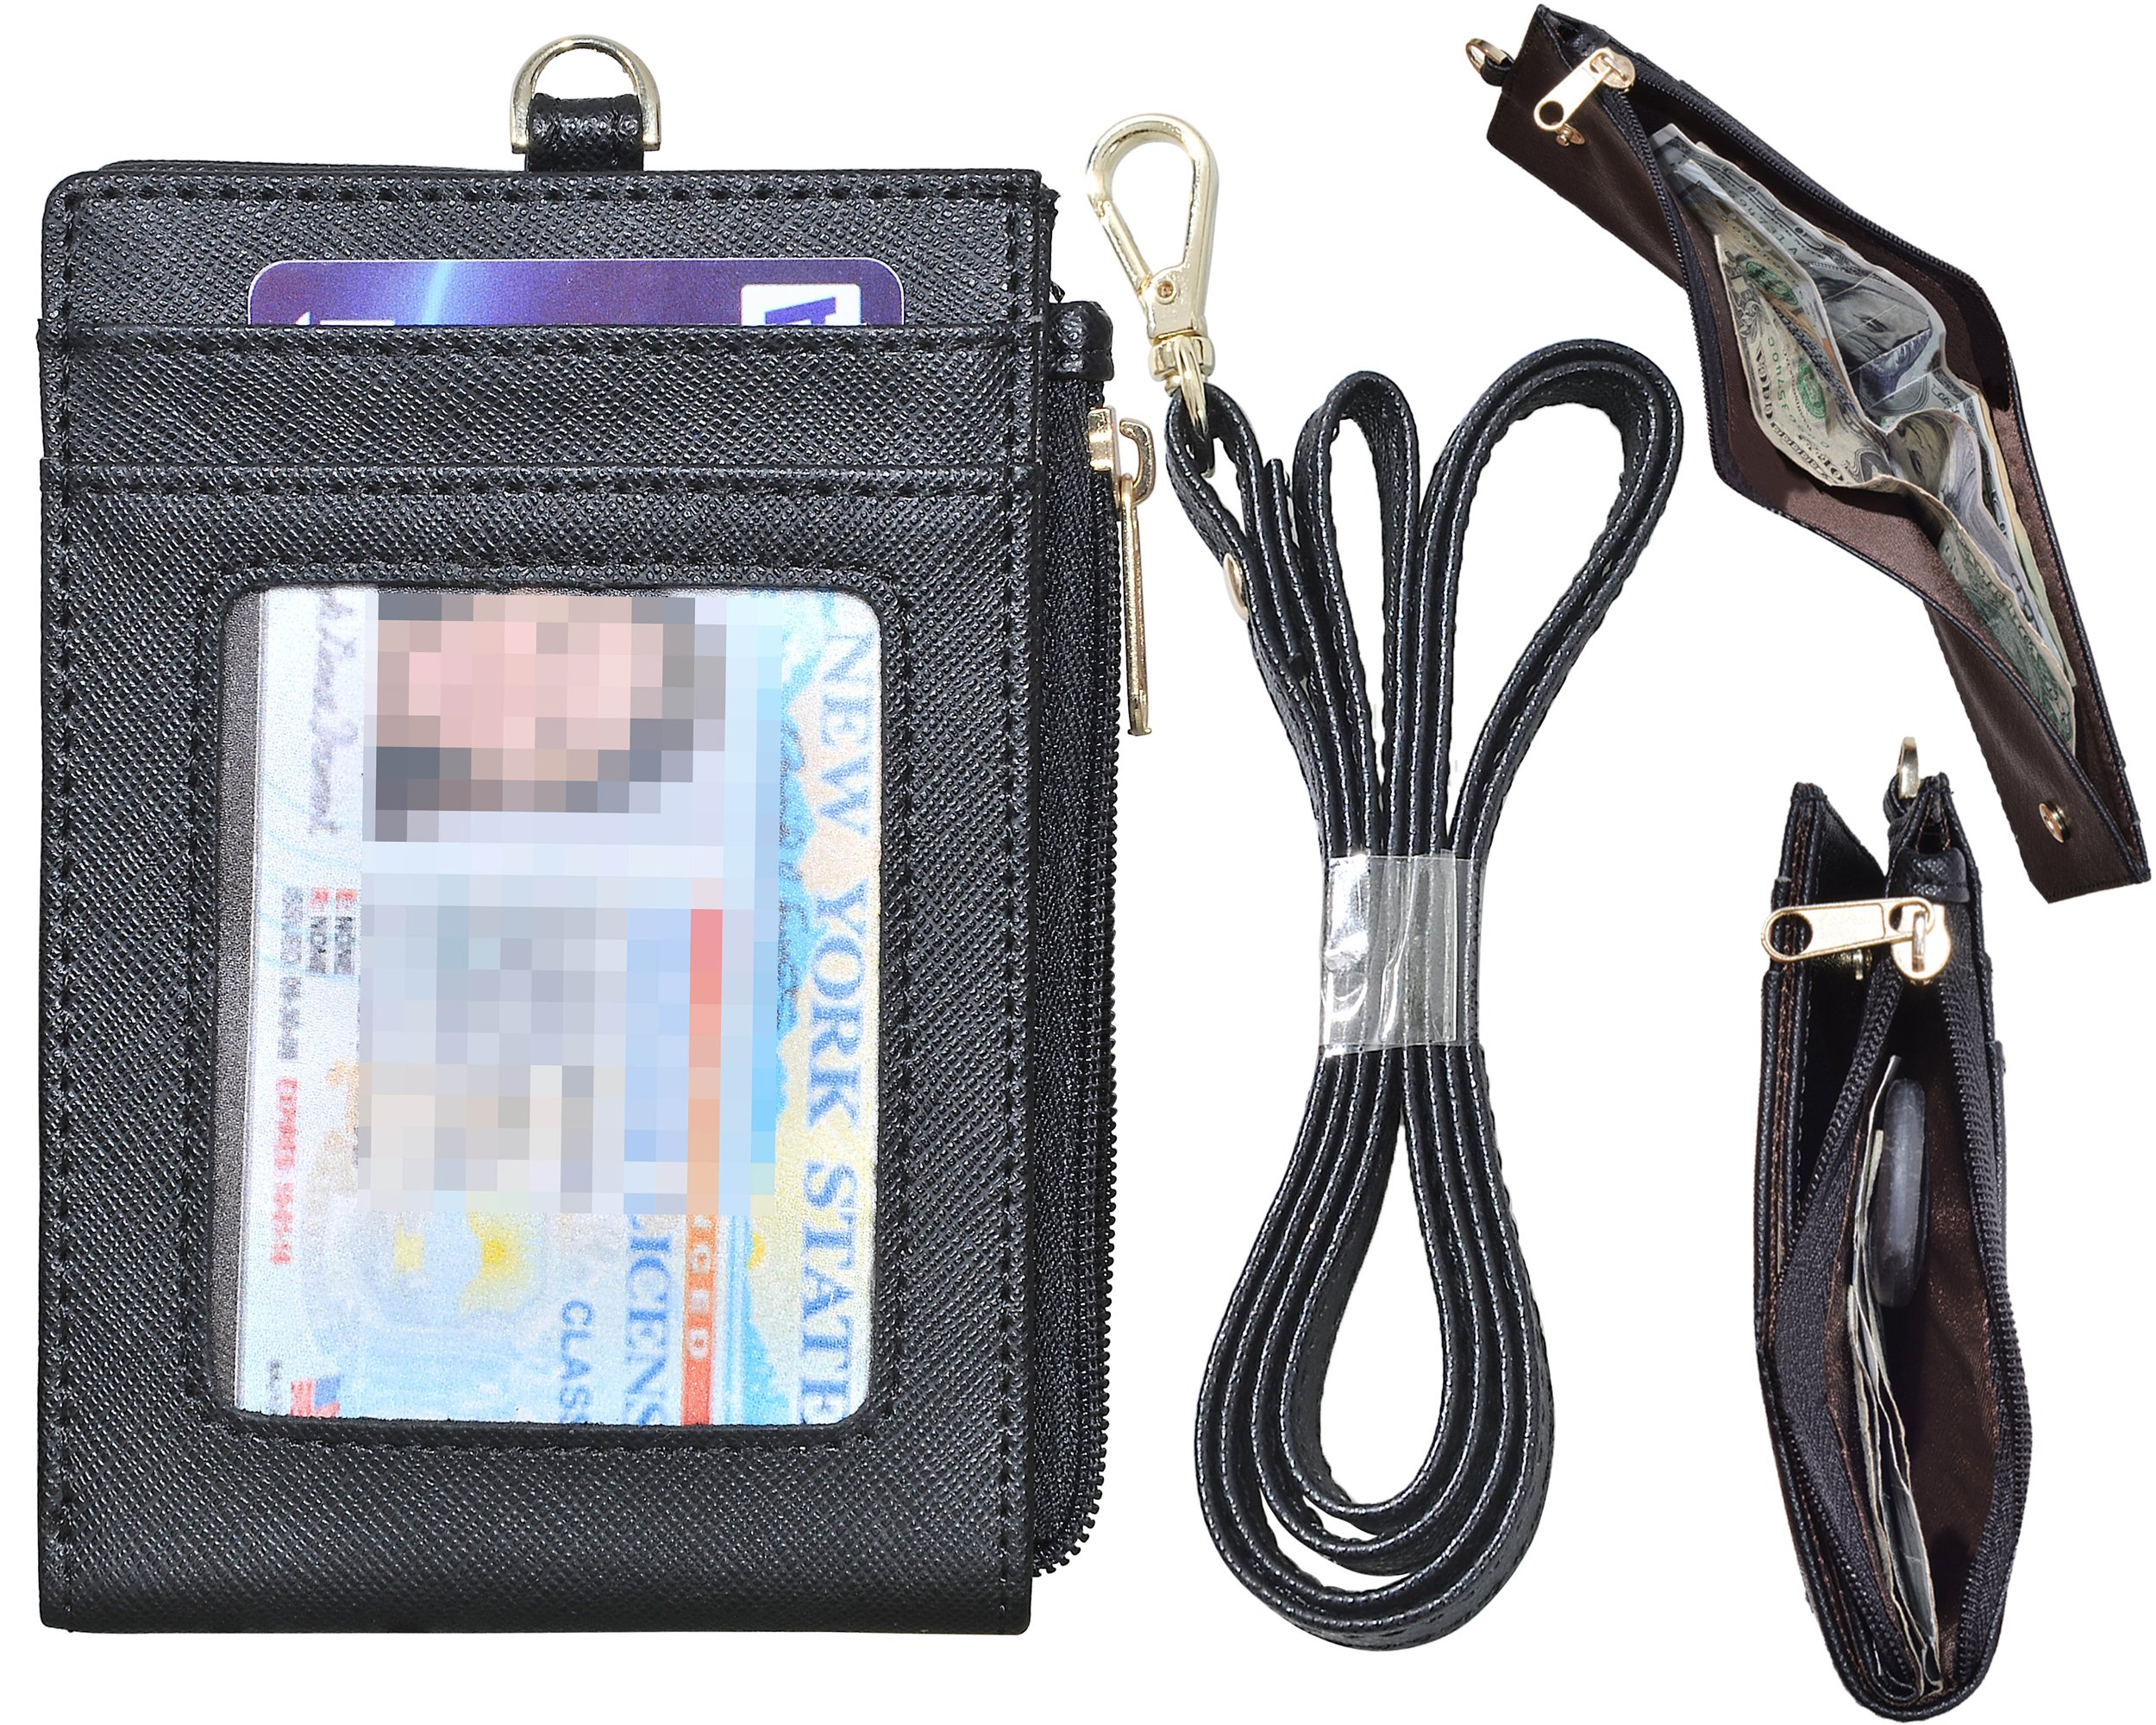 Beurlike Bifold ID Badge Holder Case Leather Credit Card Wallet Neck Lanyard (Black)